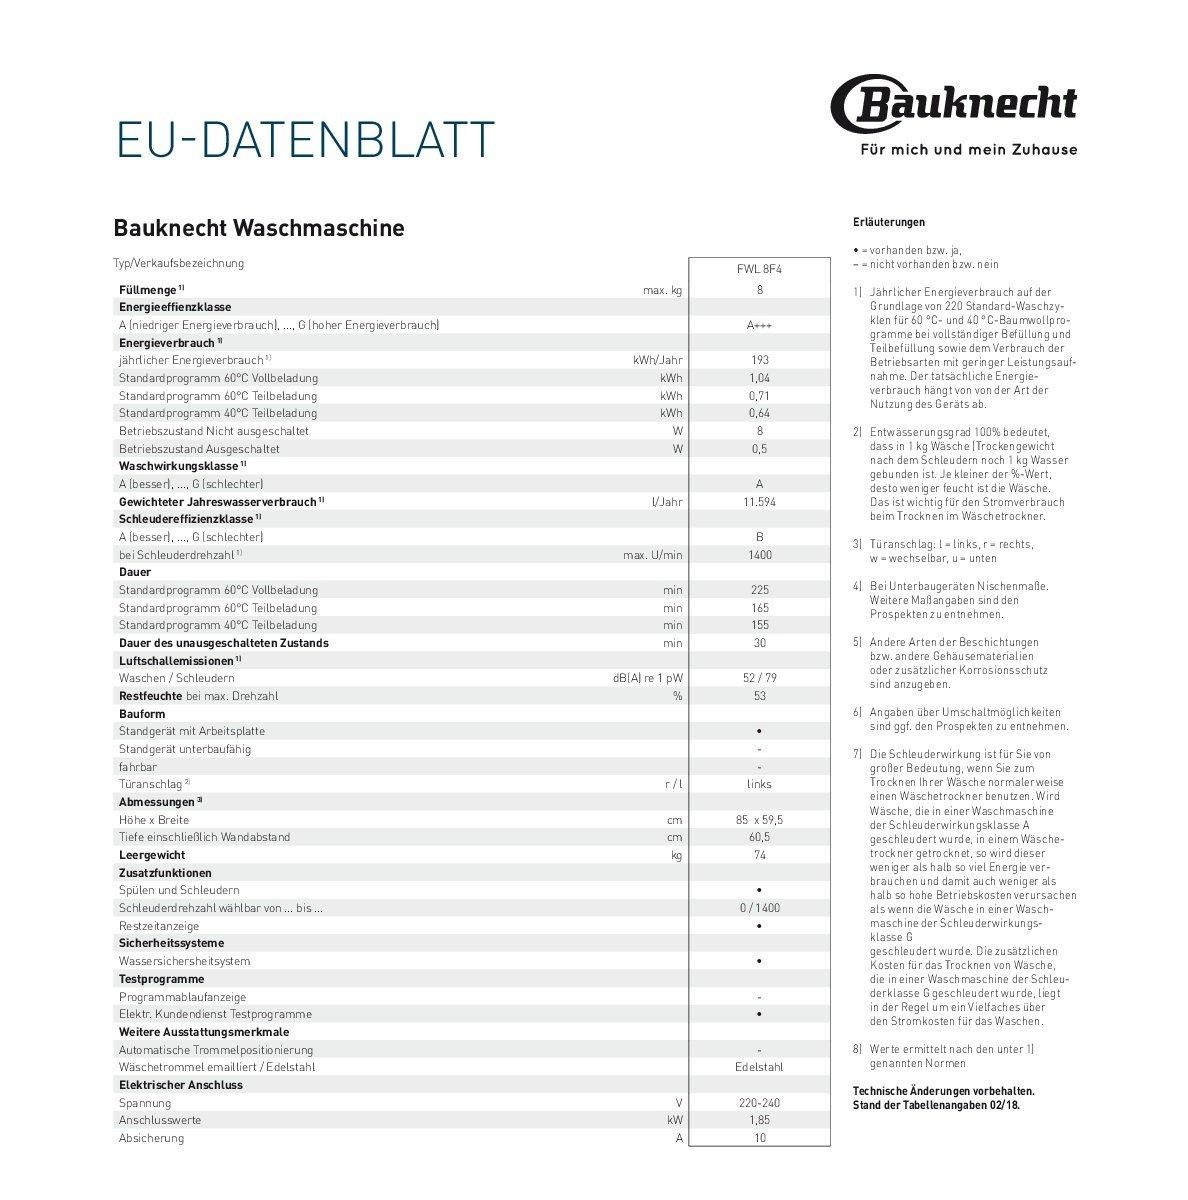 Bauknecht-FWL-8F4-Waschmaschine-Frontlader-A-1400-UpM-8-kg-Wei-langlebiger-Motor-Nachlegefunktion-Wasserschutz